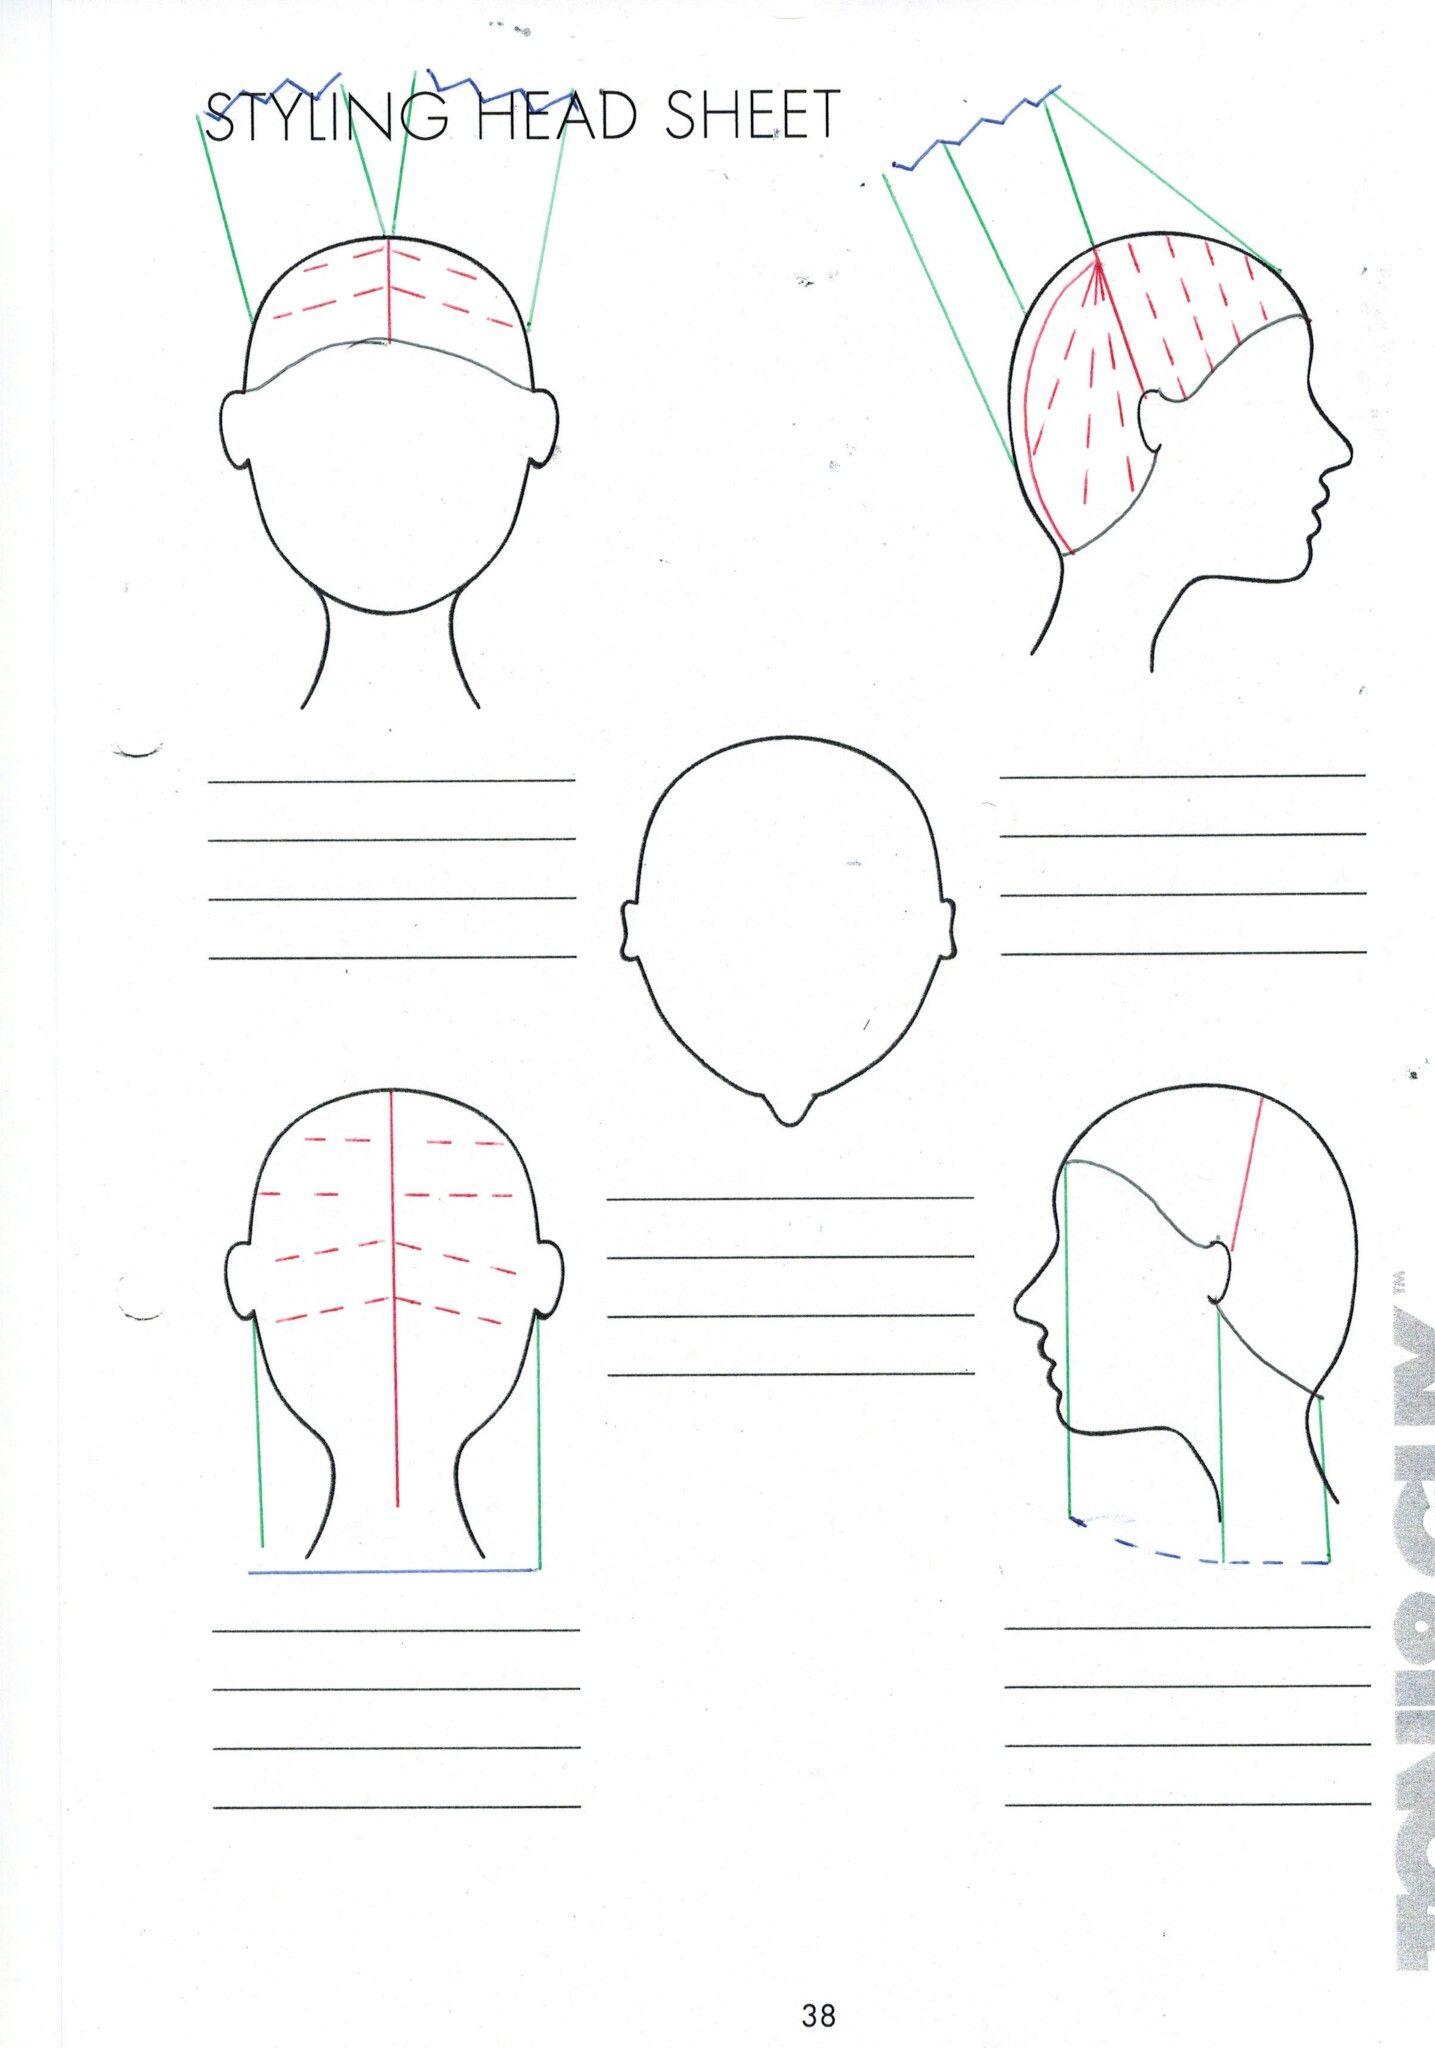 Degrees Of Diagrams For Cutting Hair | Wiring Diagram Database on food diagrams, makeup diagrams, fashion diagrams, hair diagram different layers, skin diagrams, tailoring diagrams, color diagrams, reflexology diagrams, hair layering diagram, chemistry diagrams, hvac systems diagrams, steam boiler diagrams,